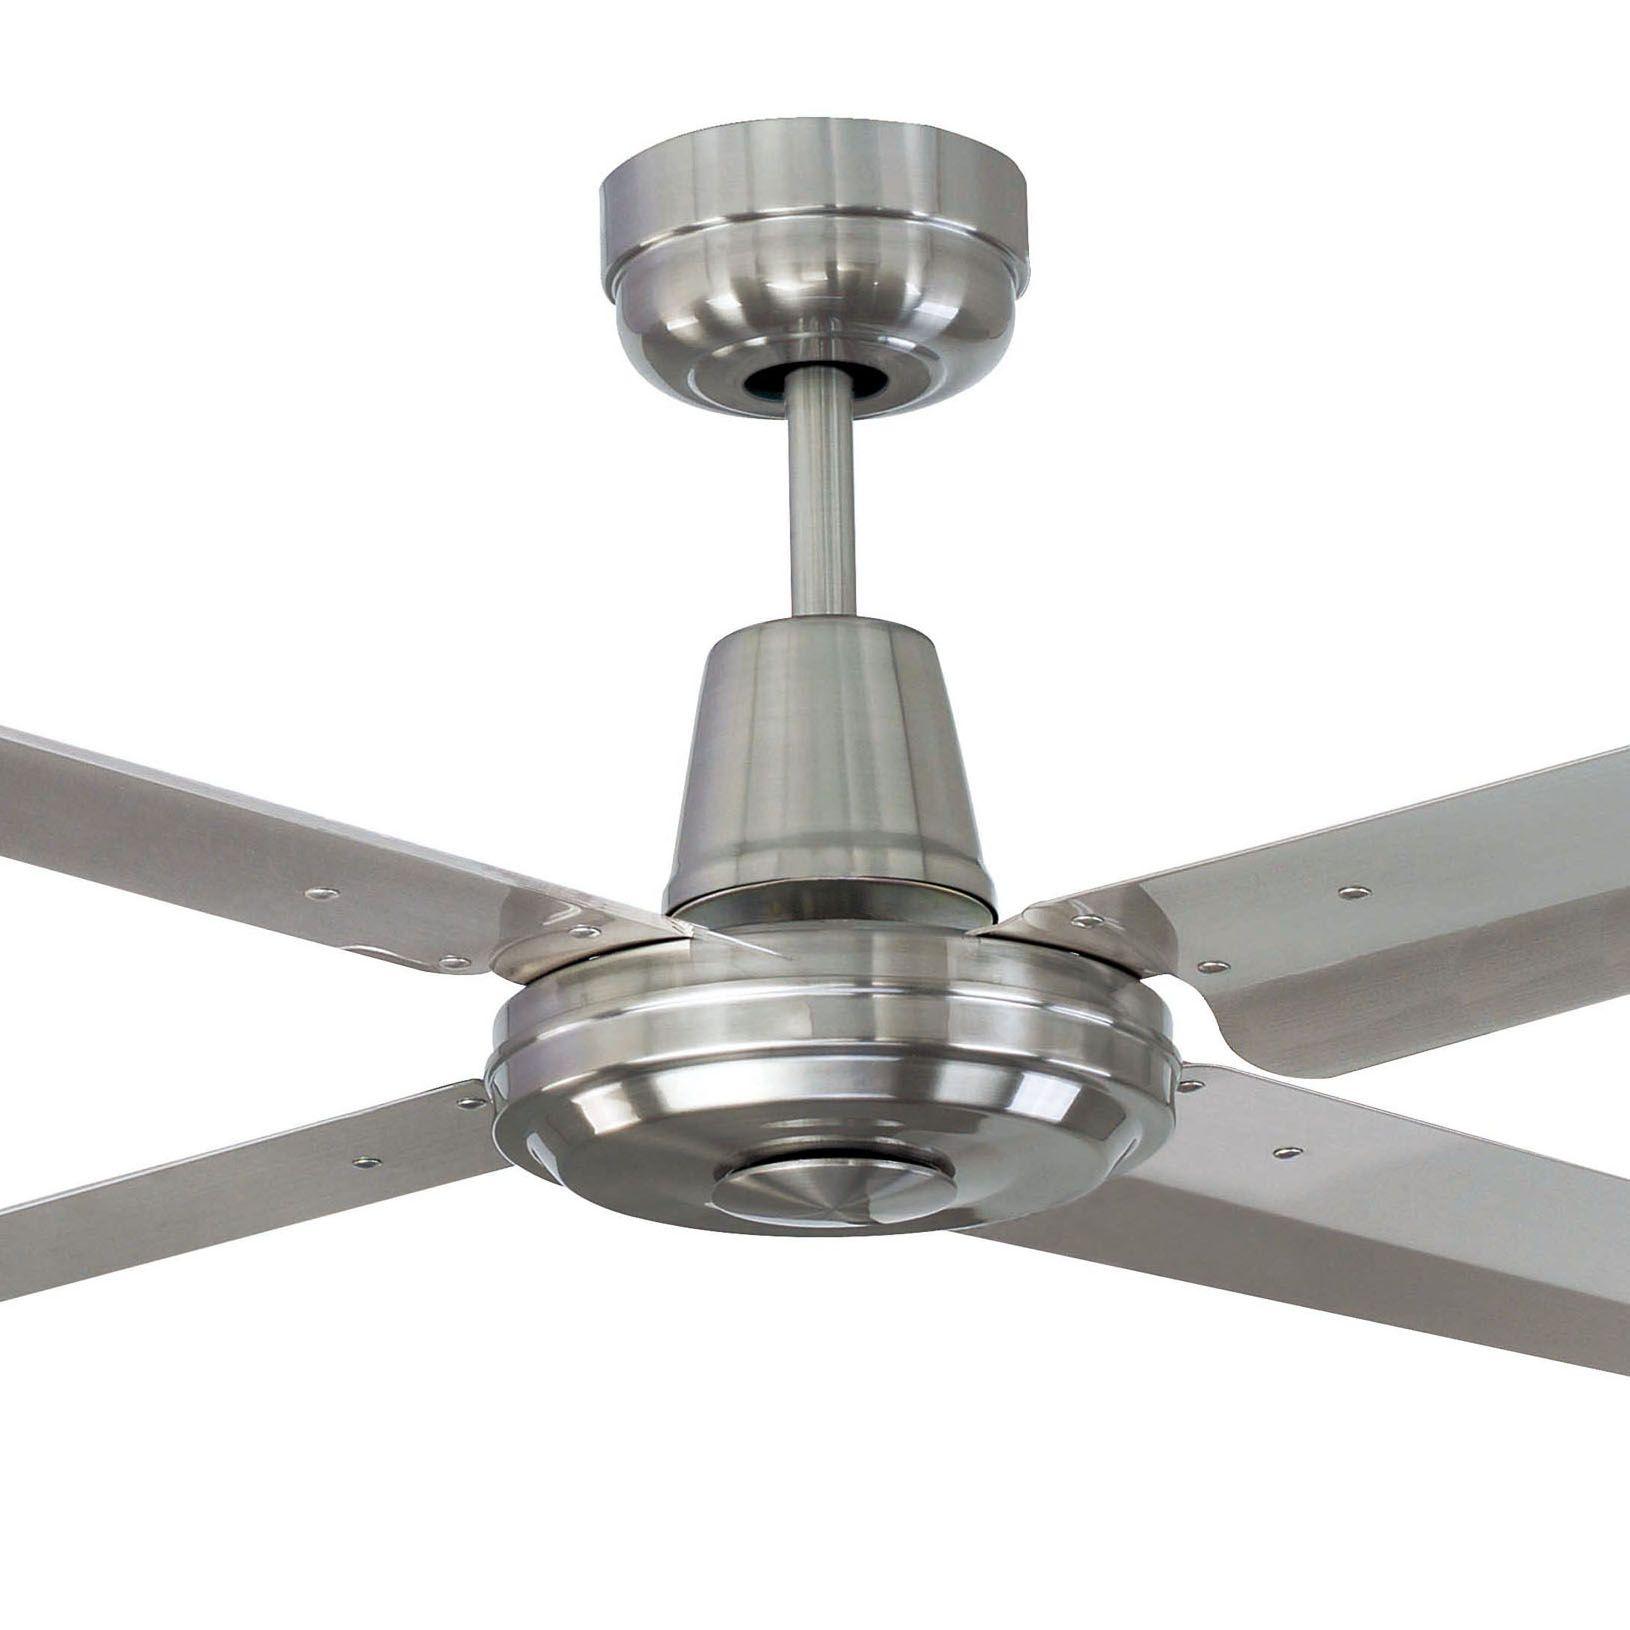 1320mm 52 Swift 316 Marine Grade Stainless Steel 3 Or 4 Blade Metal Ceiling Fan Ceiling Fan Metal Ceiling Ceiling